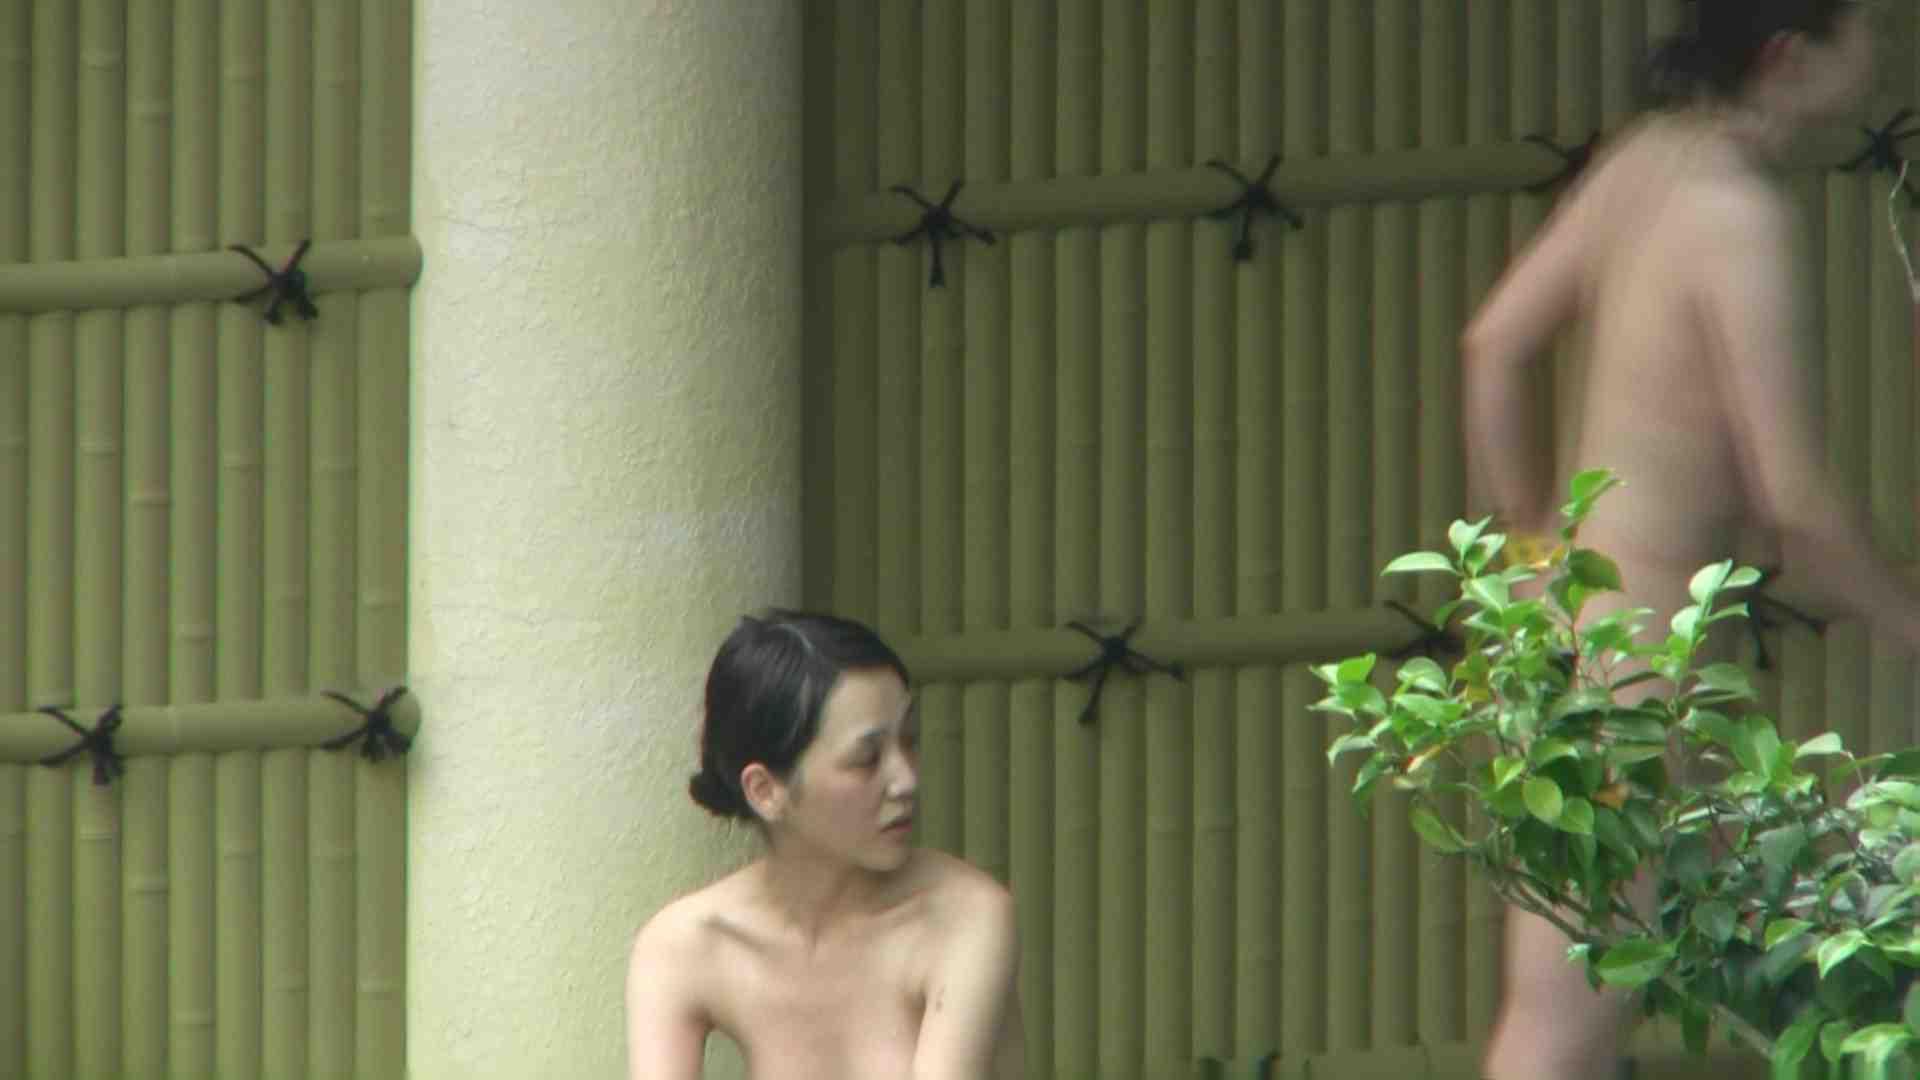 Aquaな露天風呂Vol.64【VIP限定】 露天風呂編 | 盗撮シリーズ  78PIX 67